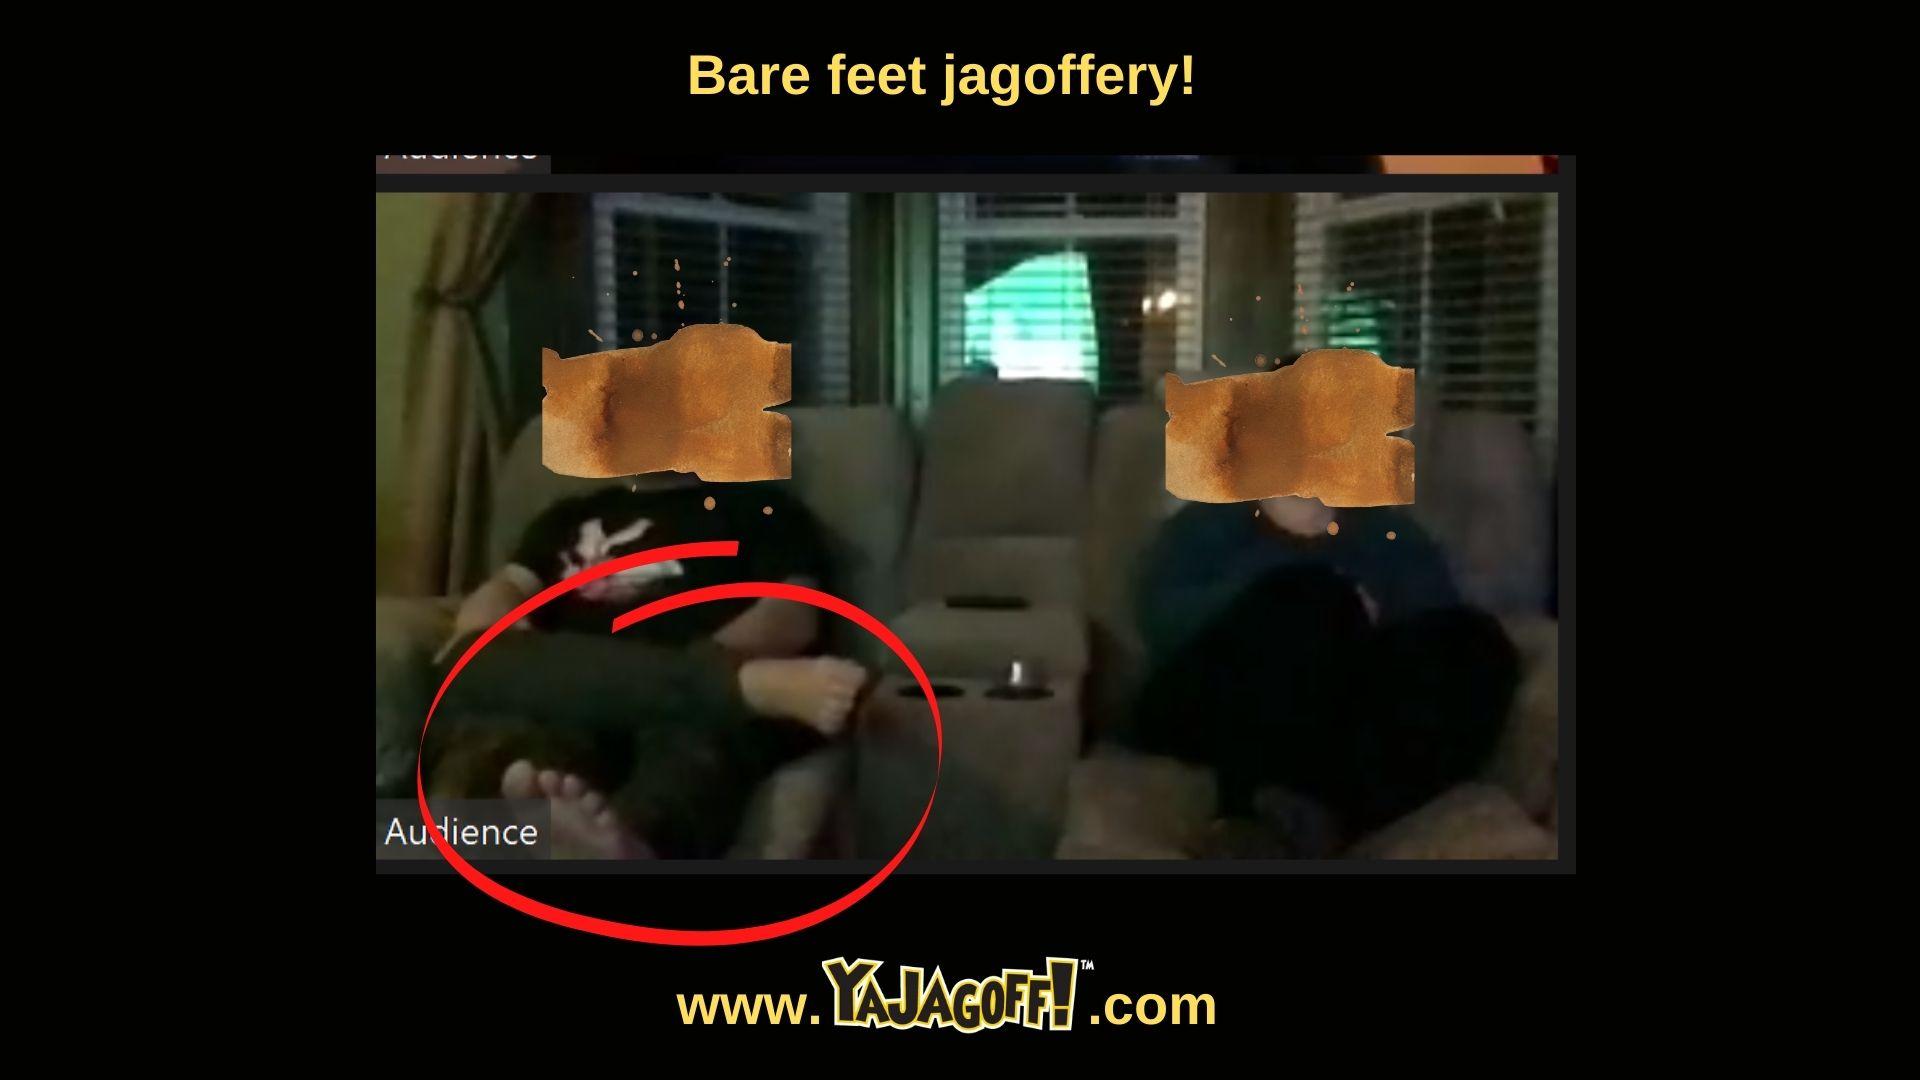 YaJagoff Blog from Pittsburgh Feet